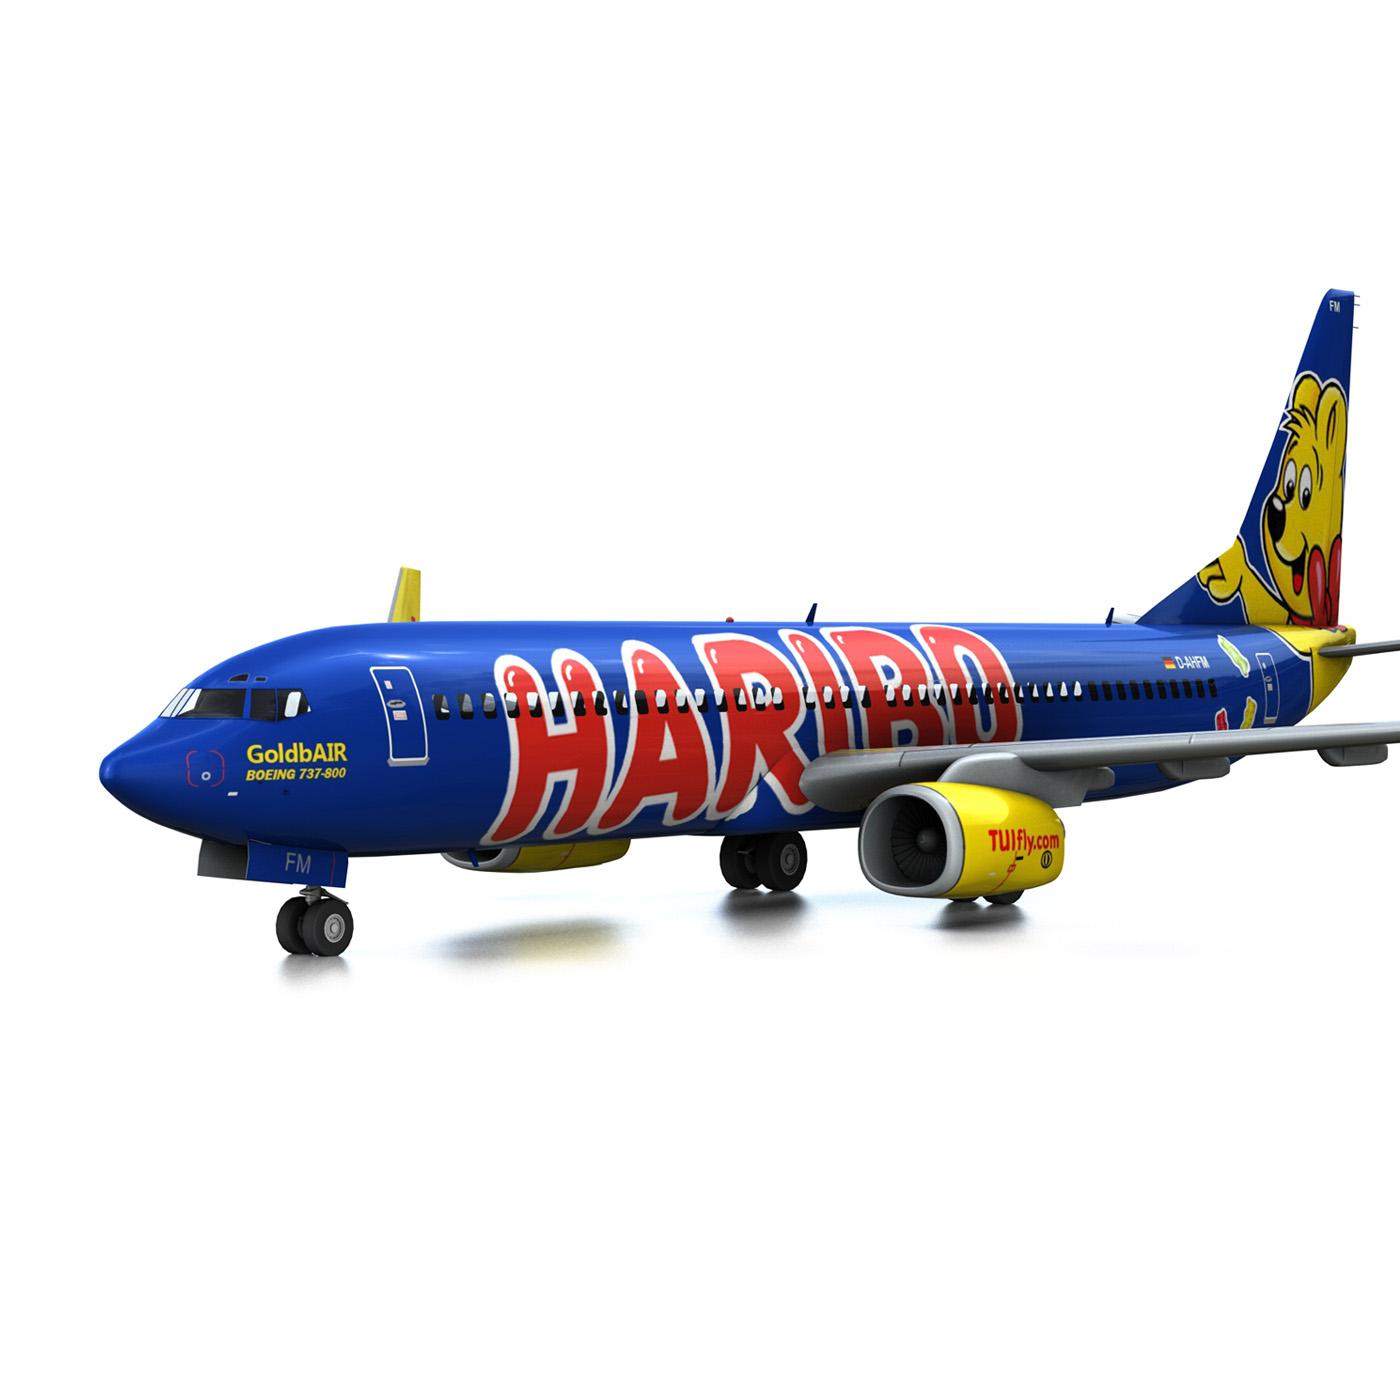 boeing 737-800 goldbair 3d model 3ds fbx c4d lwo obj 293493